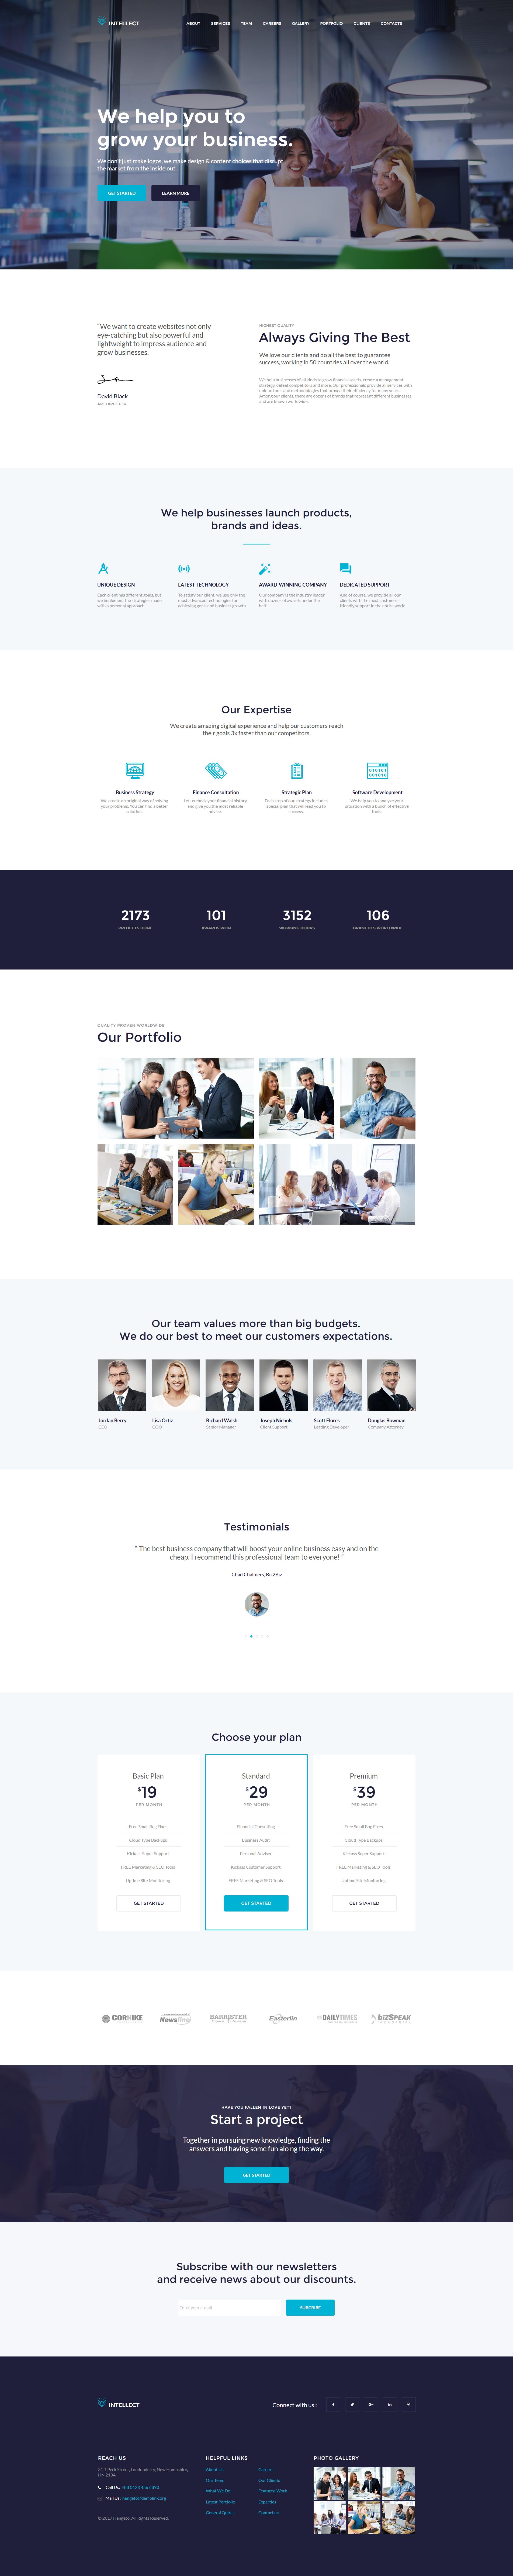 Інтелект - Шаблон HTML для бізнесу Moto CMS